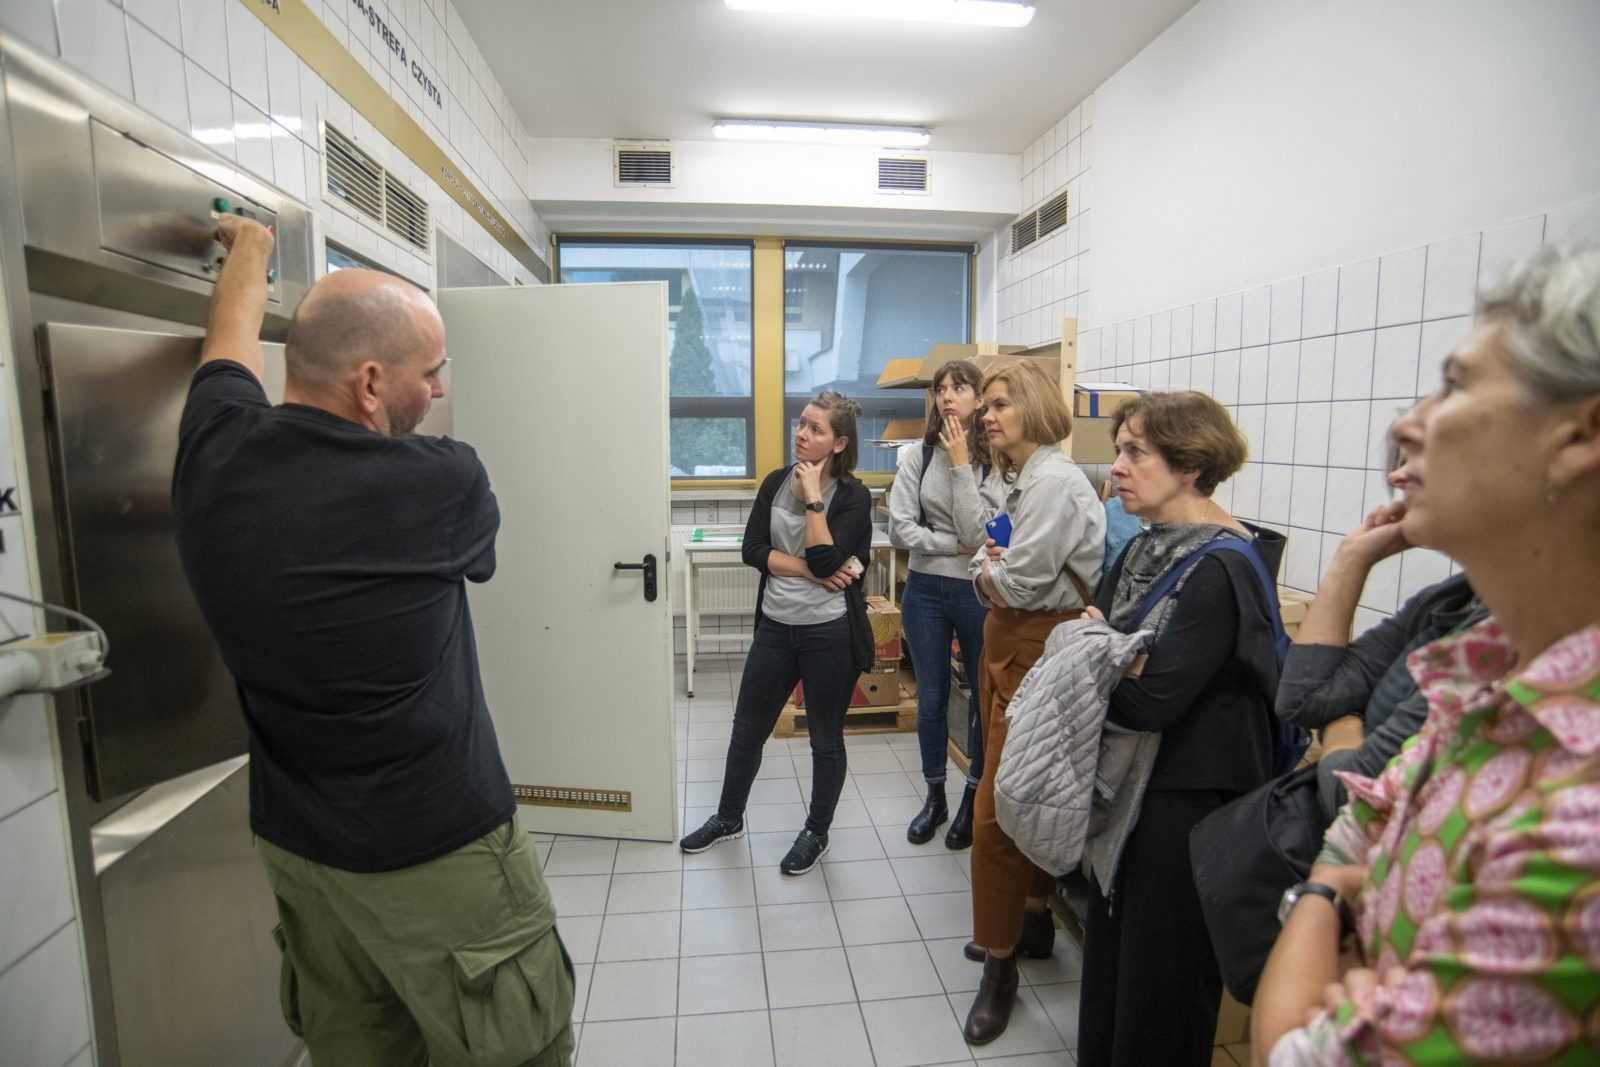 Warschau_2019_Tour_Library_of_Poland_Warsaw_Stasiuk_Konrad_192